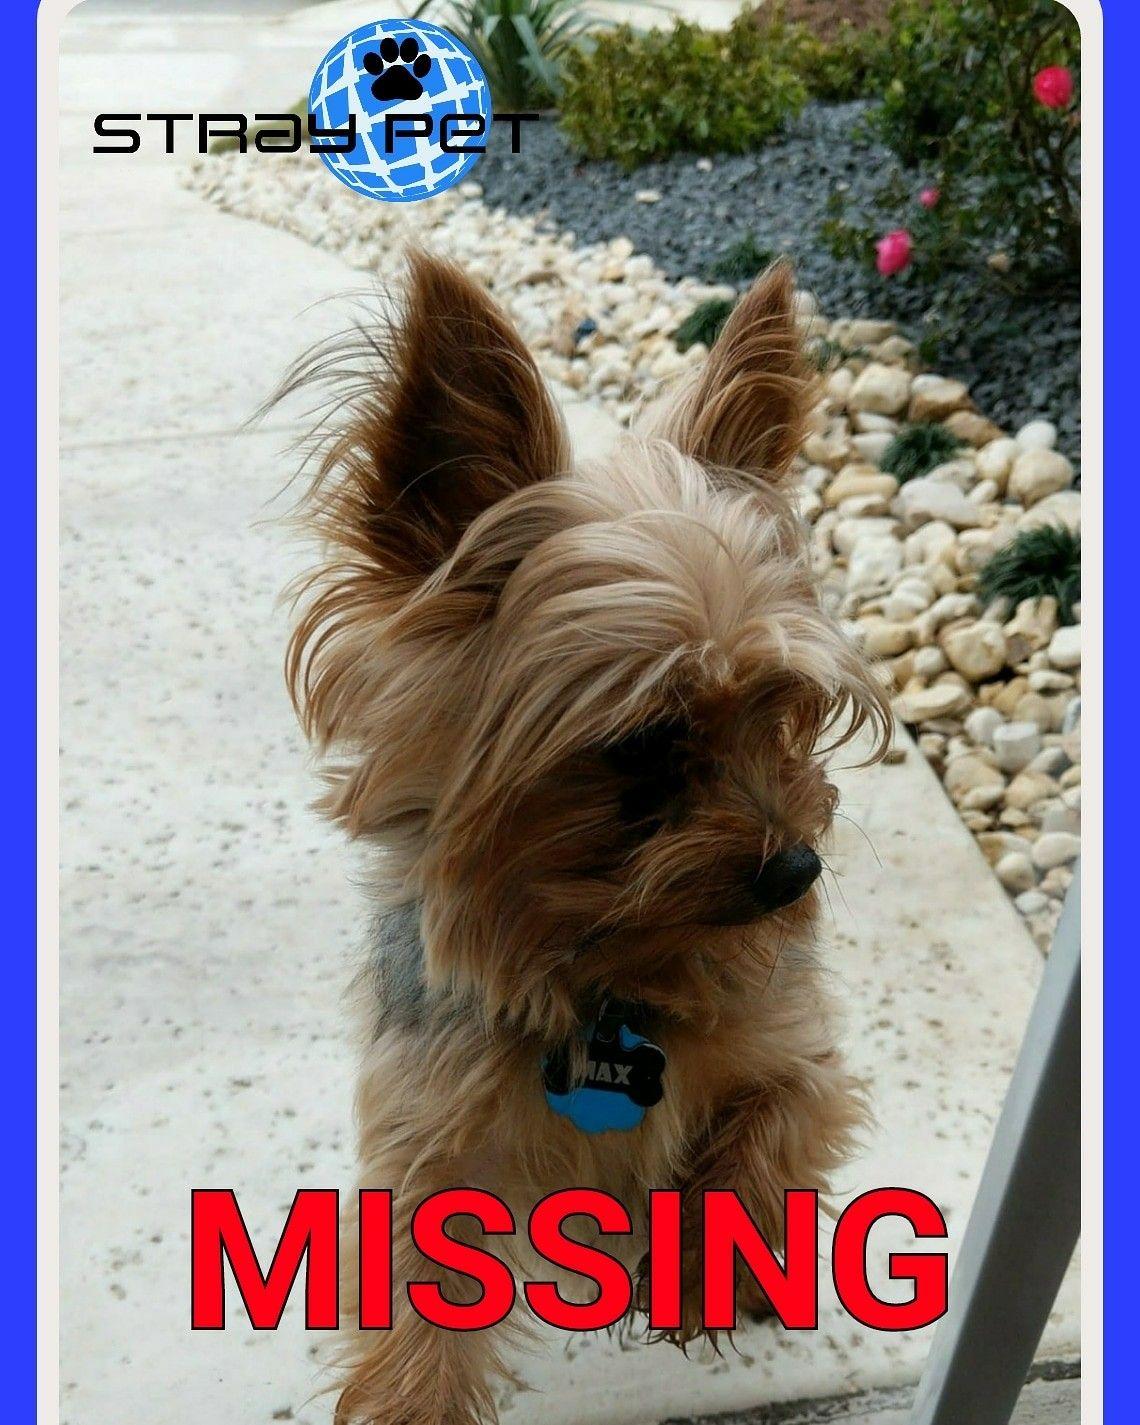 Missing Pet Alert San Antonio, Texas (78249) https